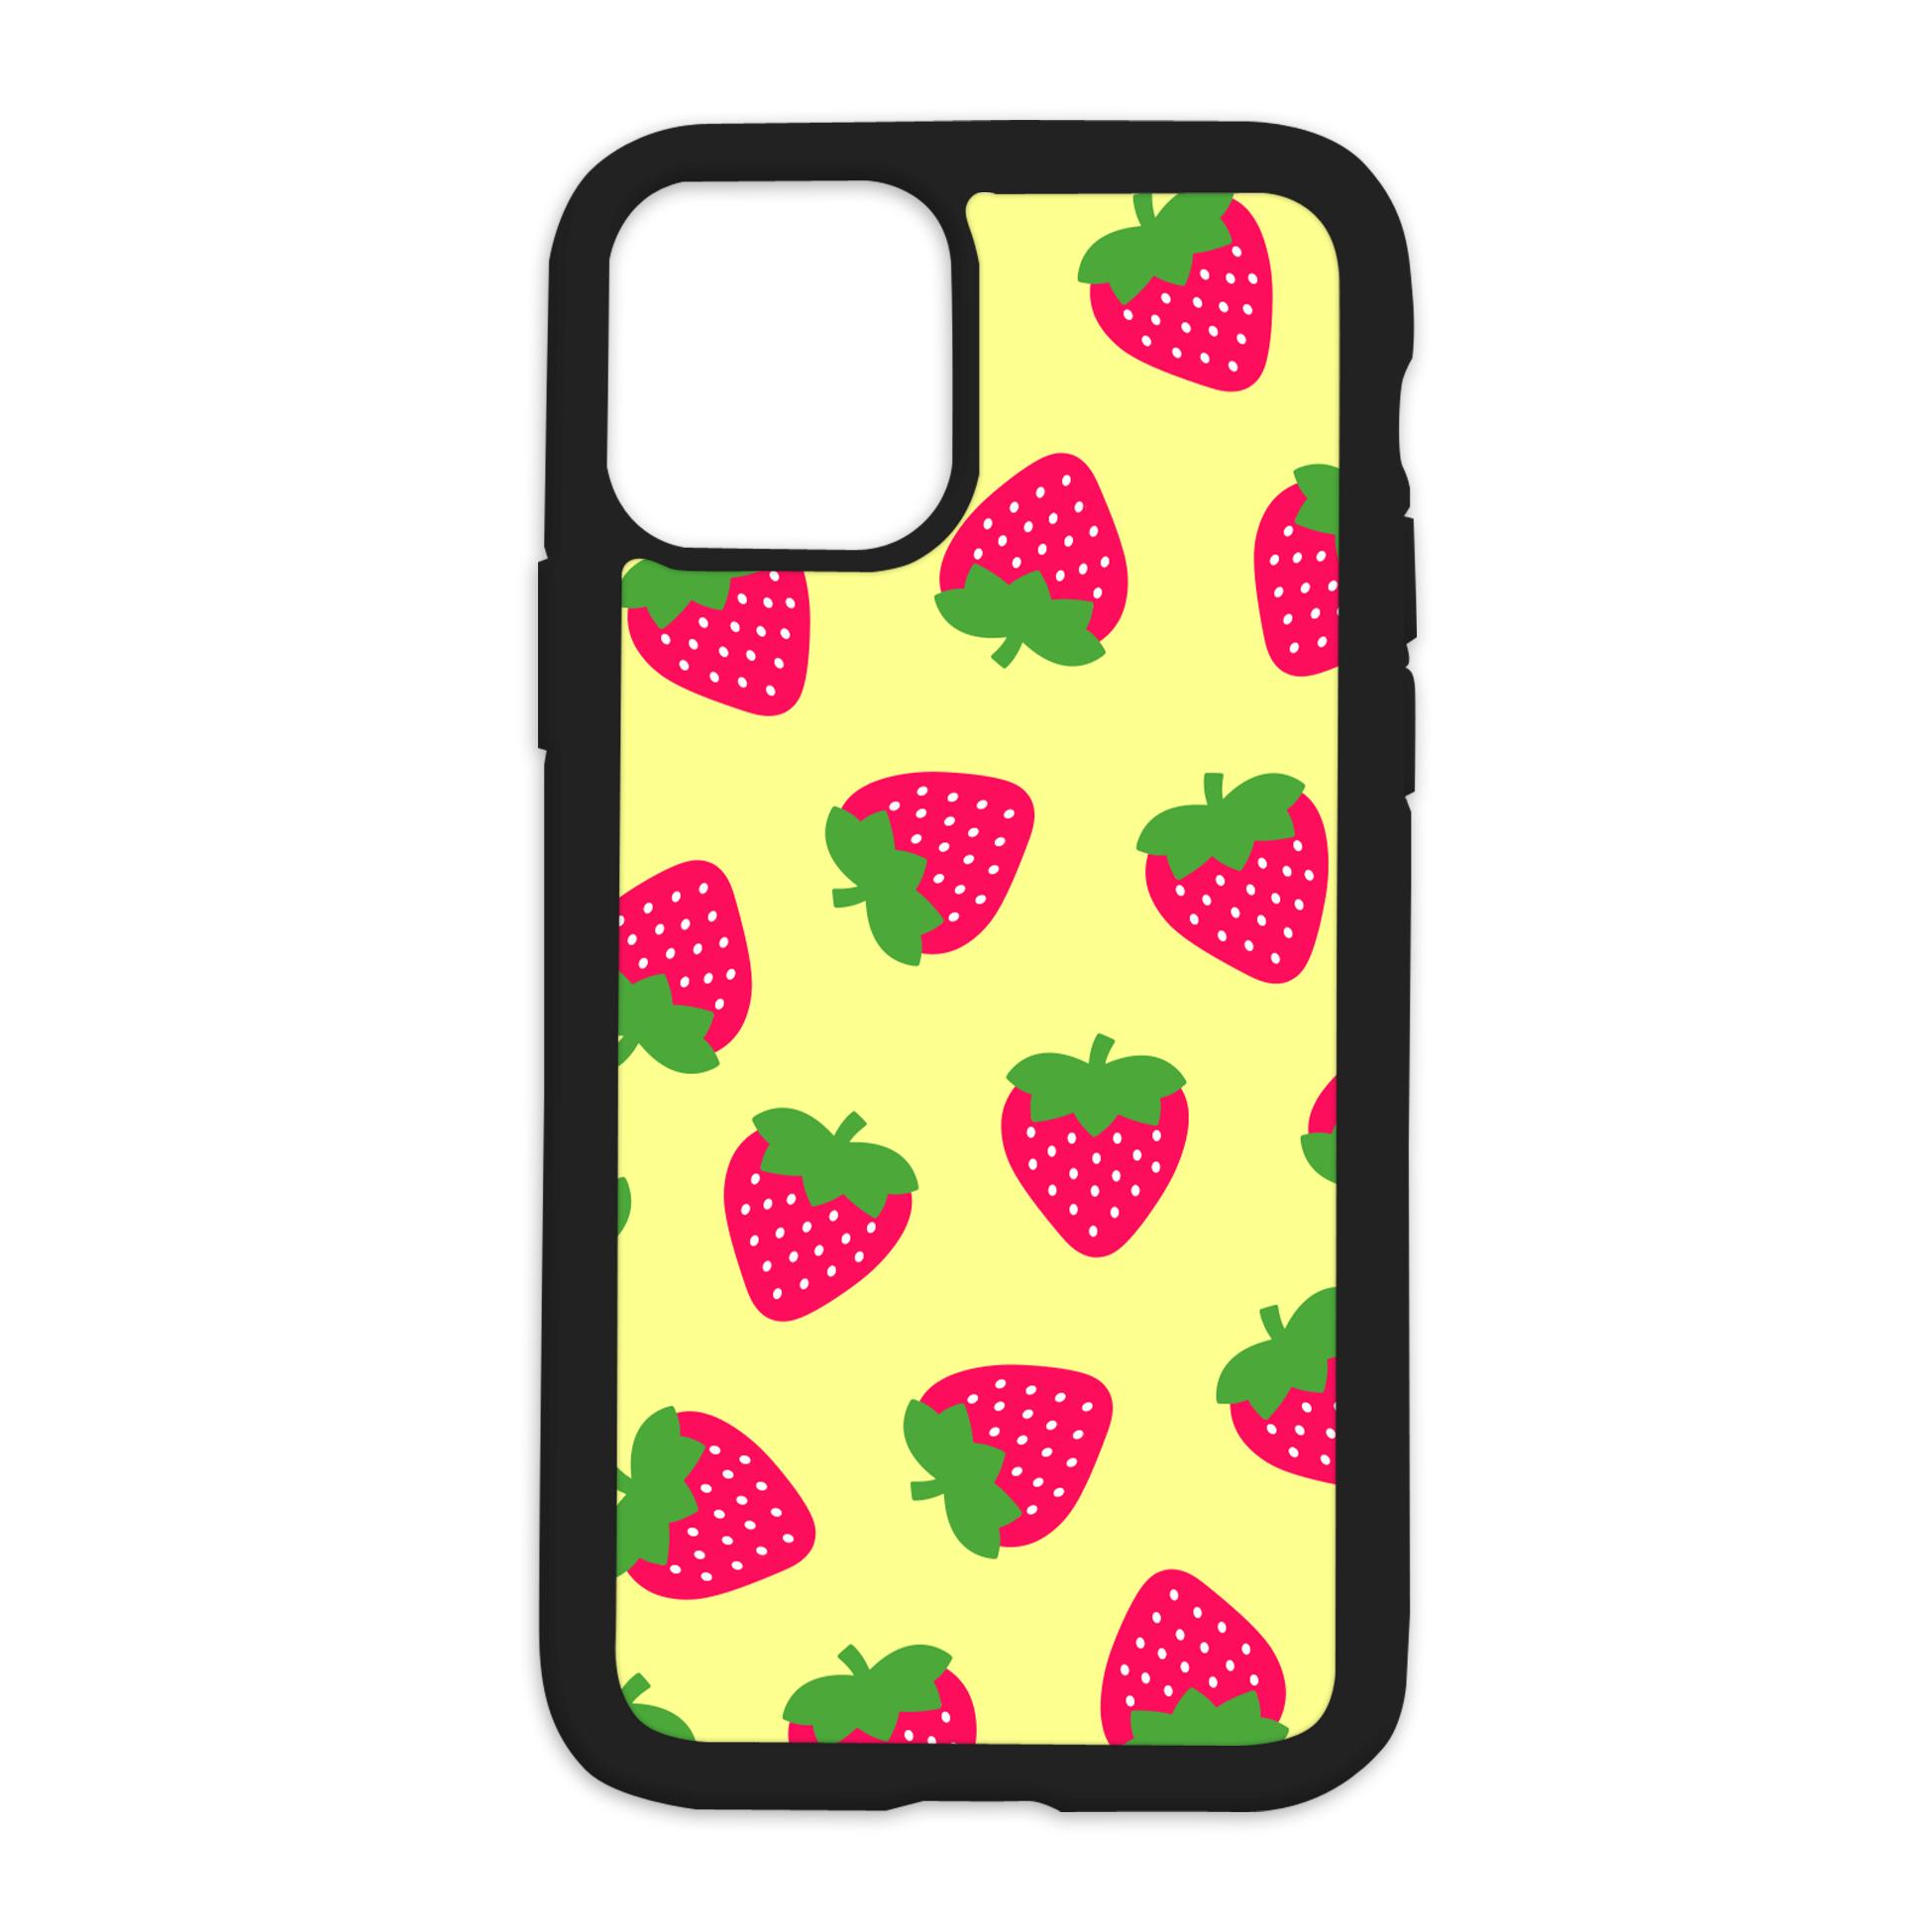 Strawberry Pattern Design On Black Phone Case - XS MAX / Yellow